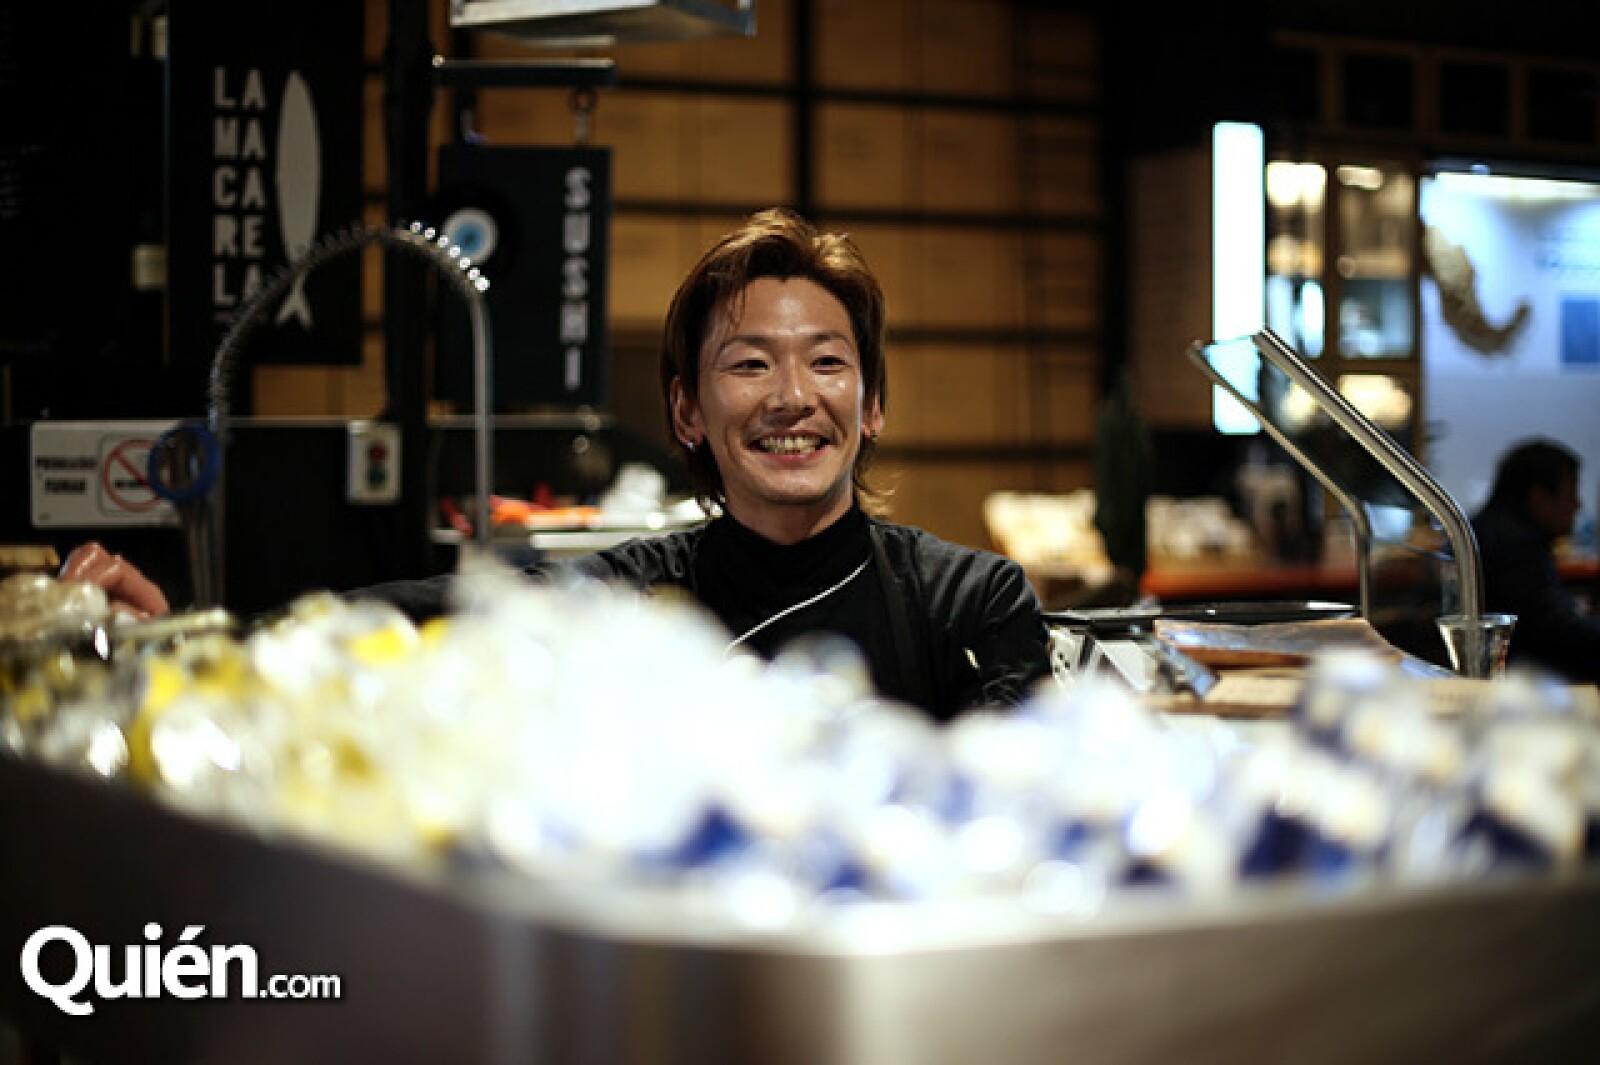 Yusuke Kodure